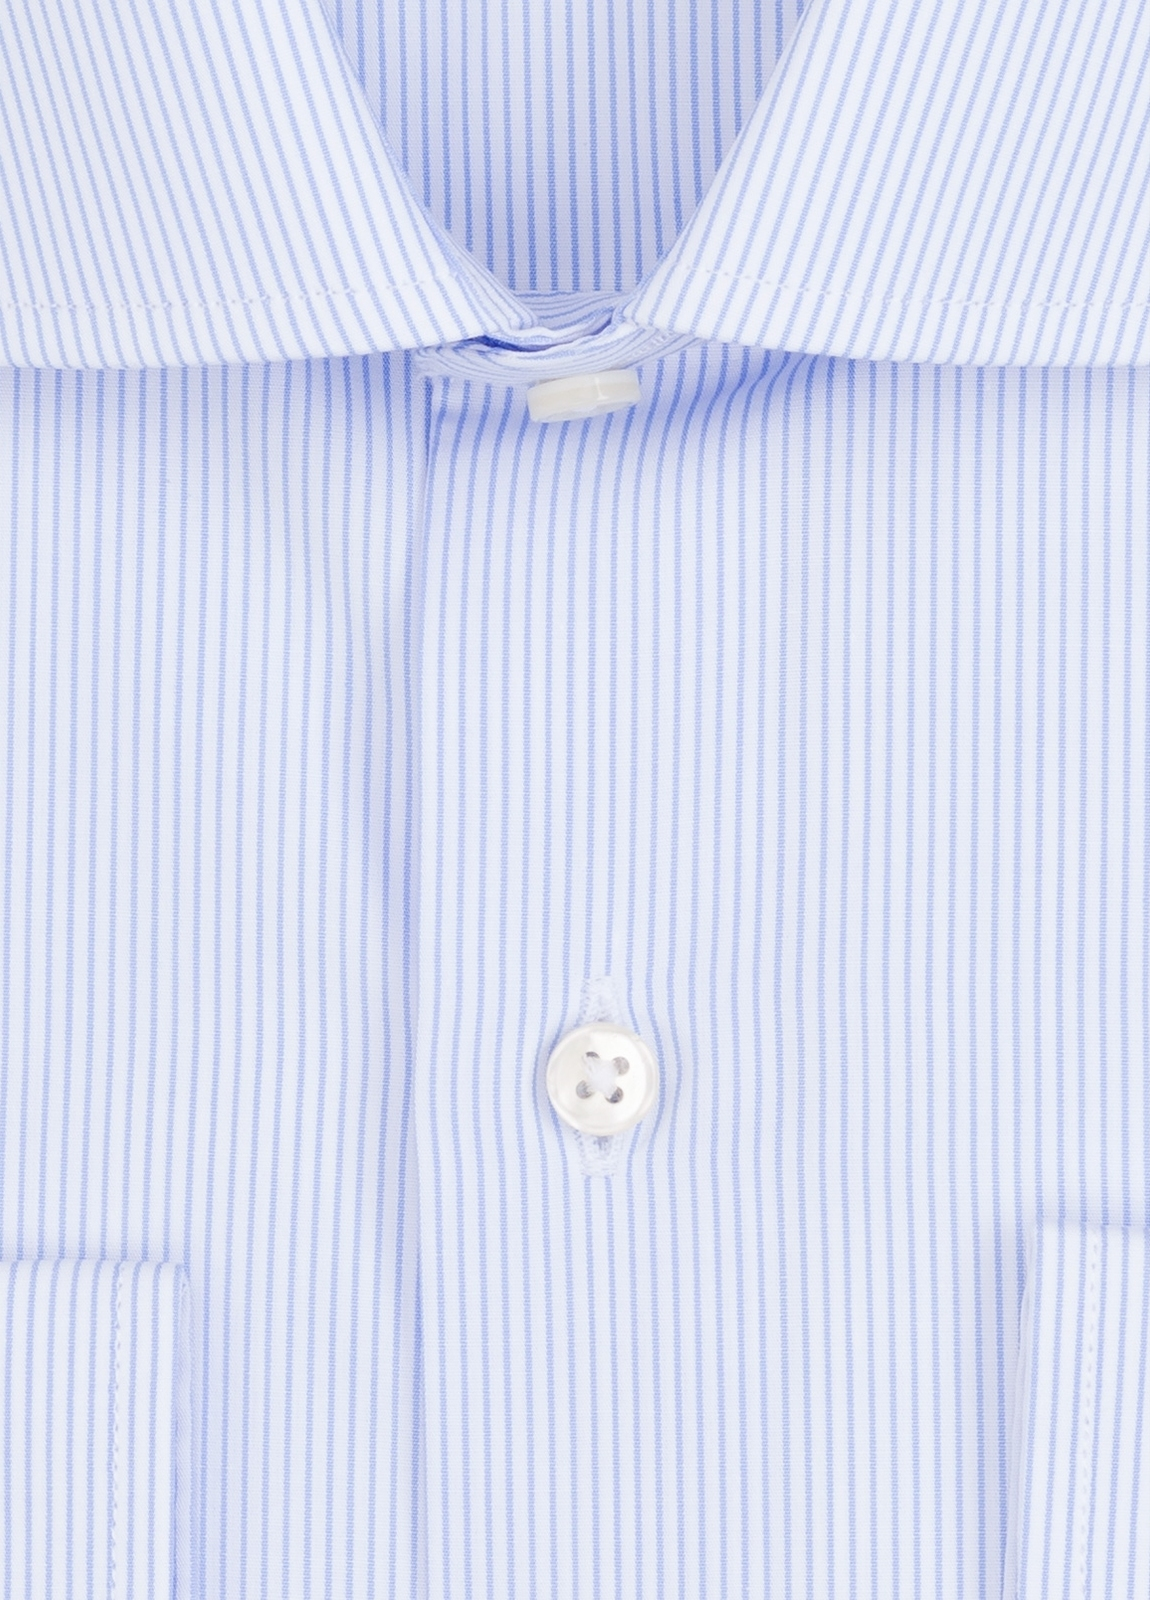 Camisa Formal Wear REGULAR FIT cuello italiano modelo TAILORED NAPOLI con diseño de rayas, color celeste. 100% Algodón. - Ítem1